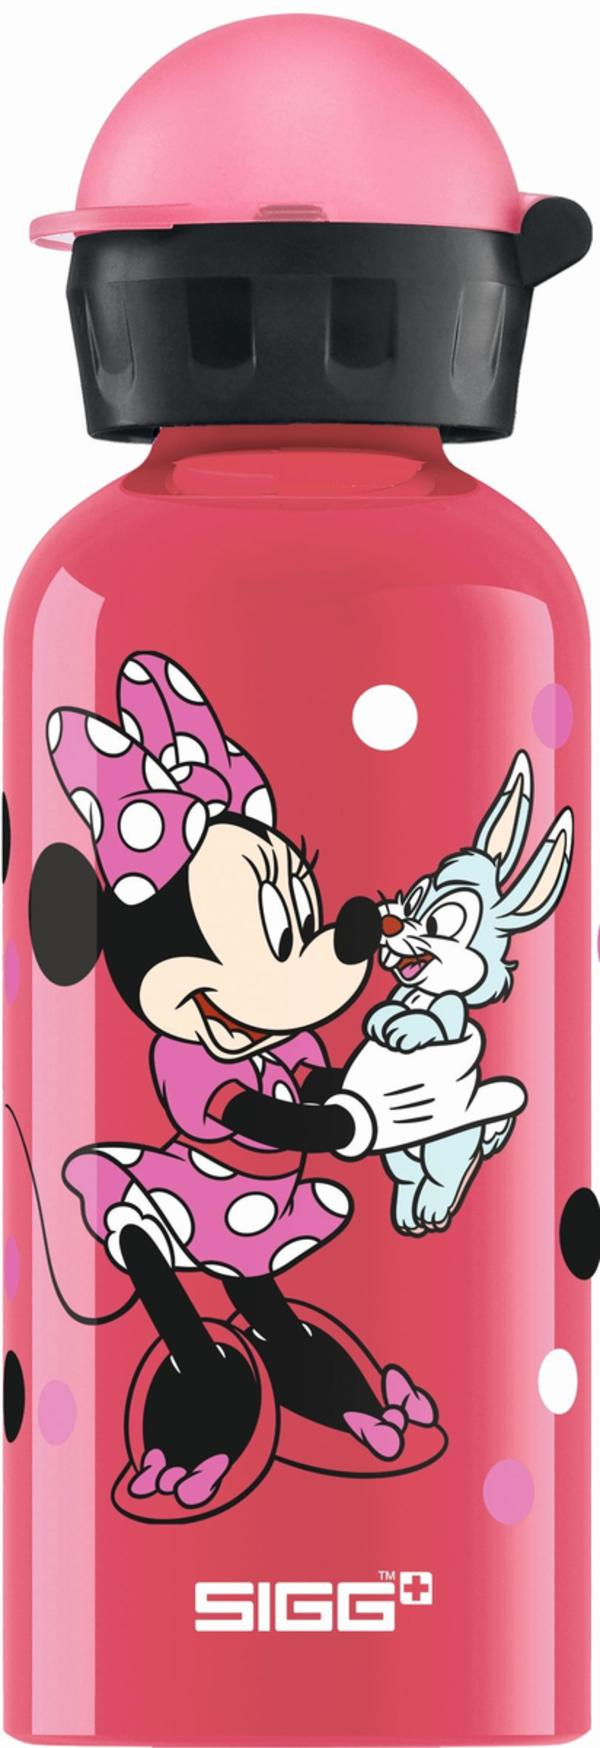 SIGG Trinkflasche Kids Alu Minnie Mouse 0.4